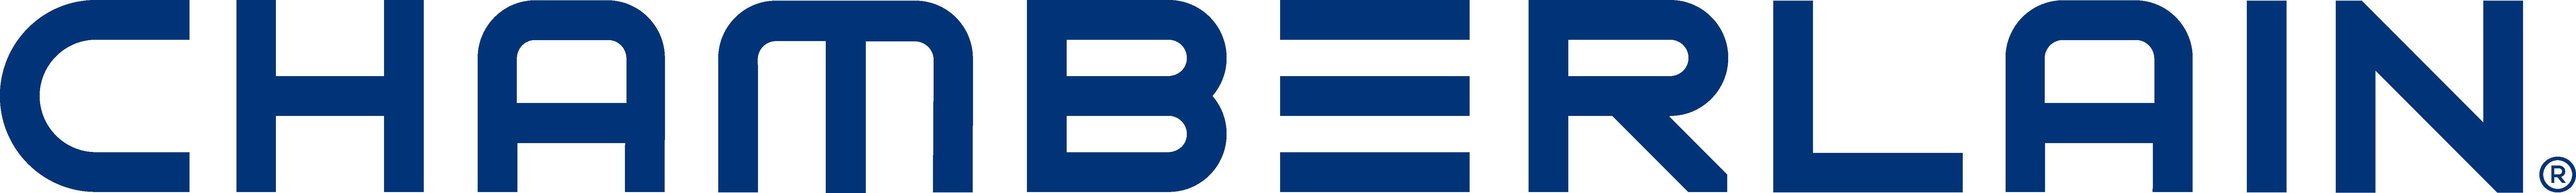 Chamberlain-logo-blue